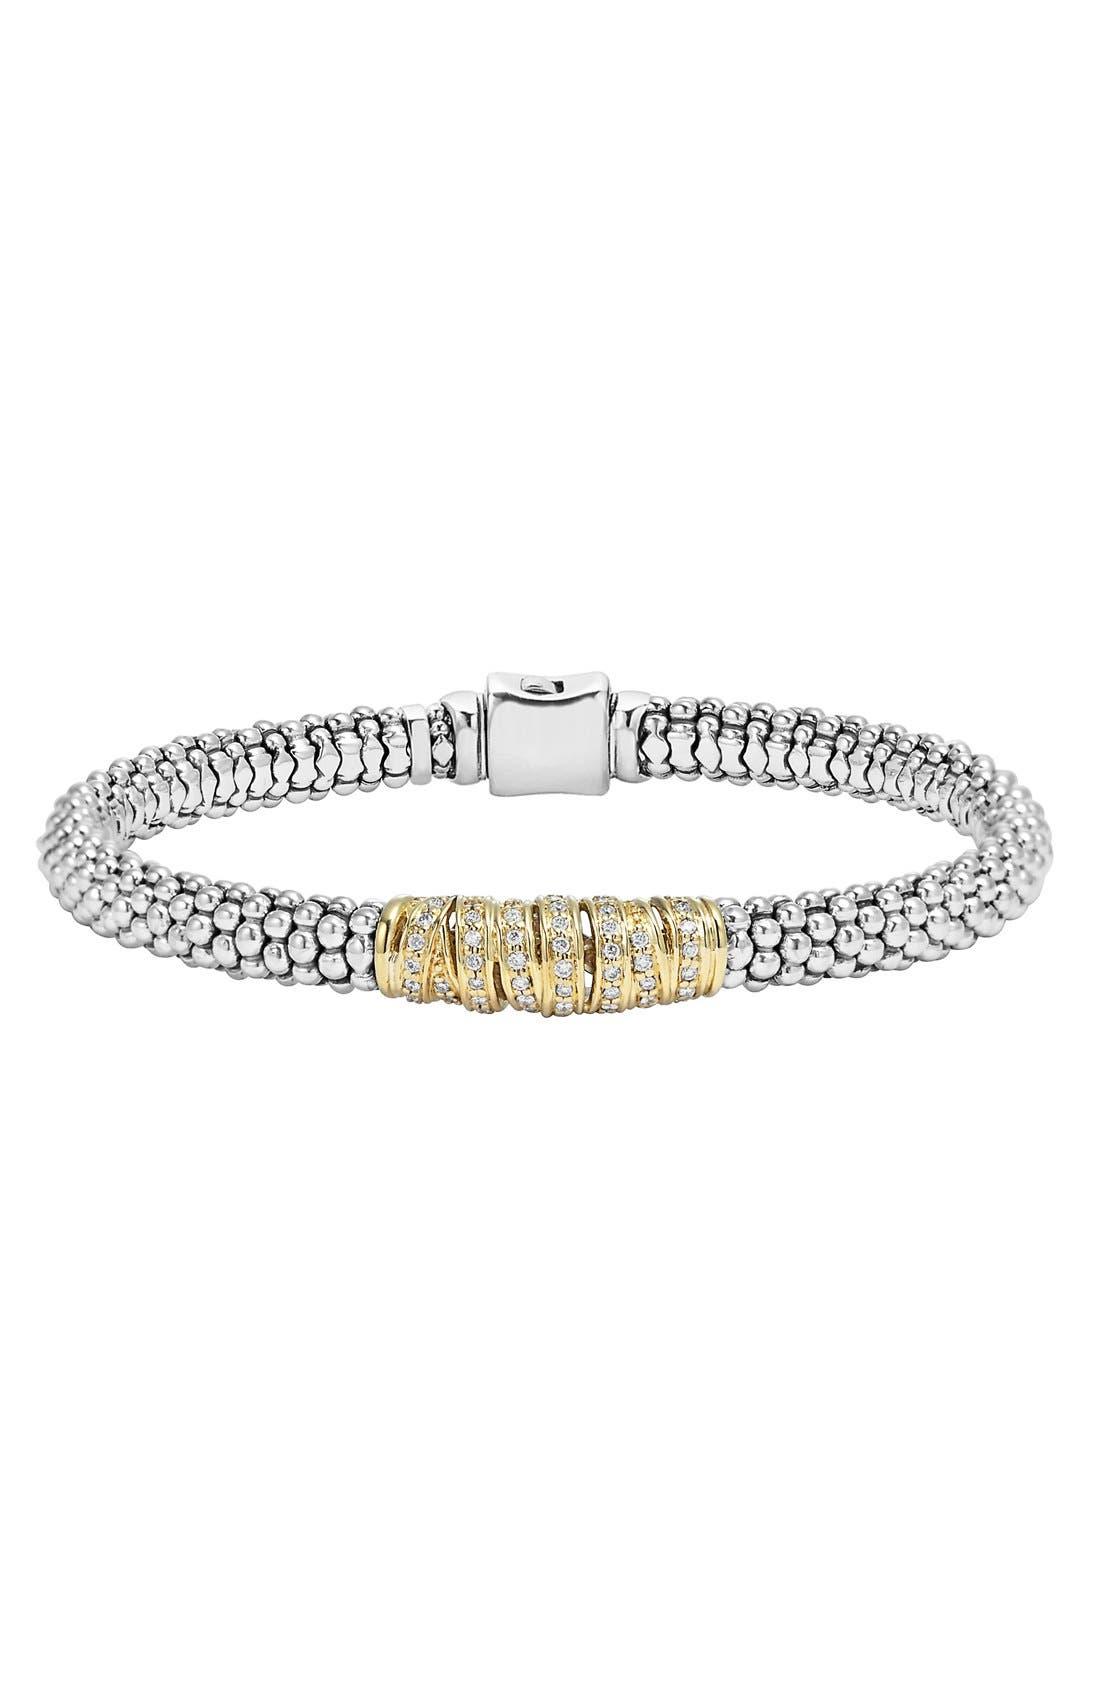 'Diamonds & Caviar' Diamond Bracelet,                         Main,                         color, Sterling Silver/ Gold